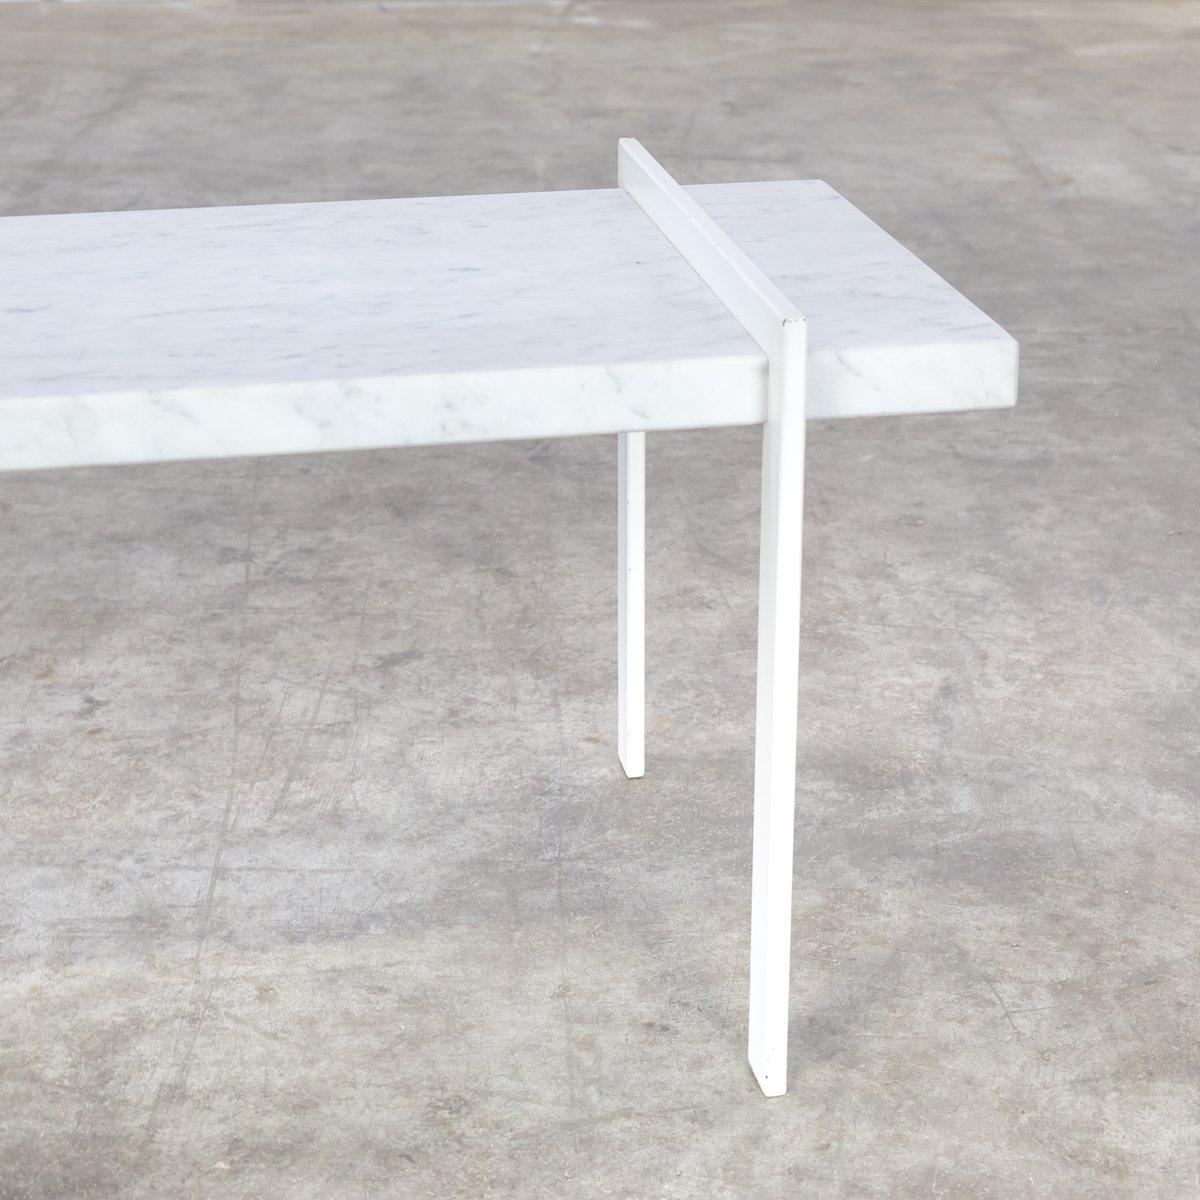 vintage beistelltisch aus metall bianco carrara marmor. Black Bedroom Furniture Sets. Home Design Ideas